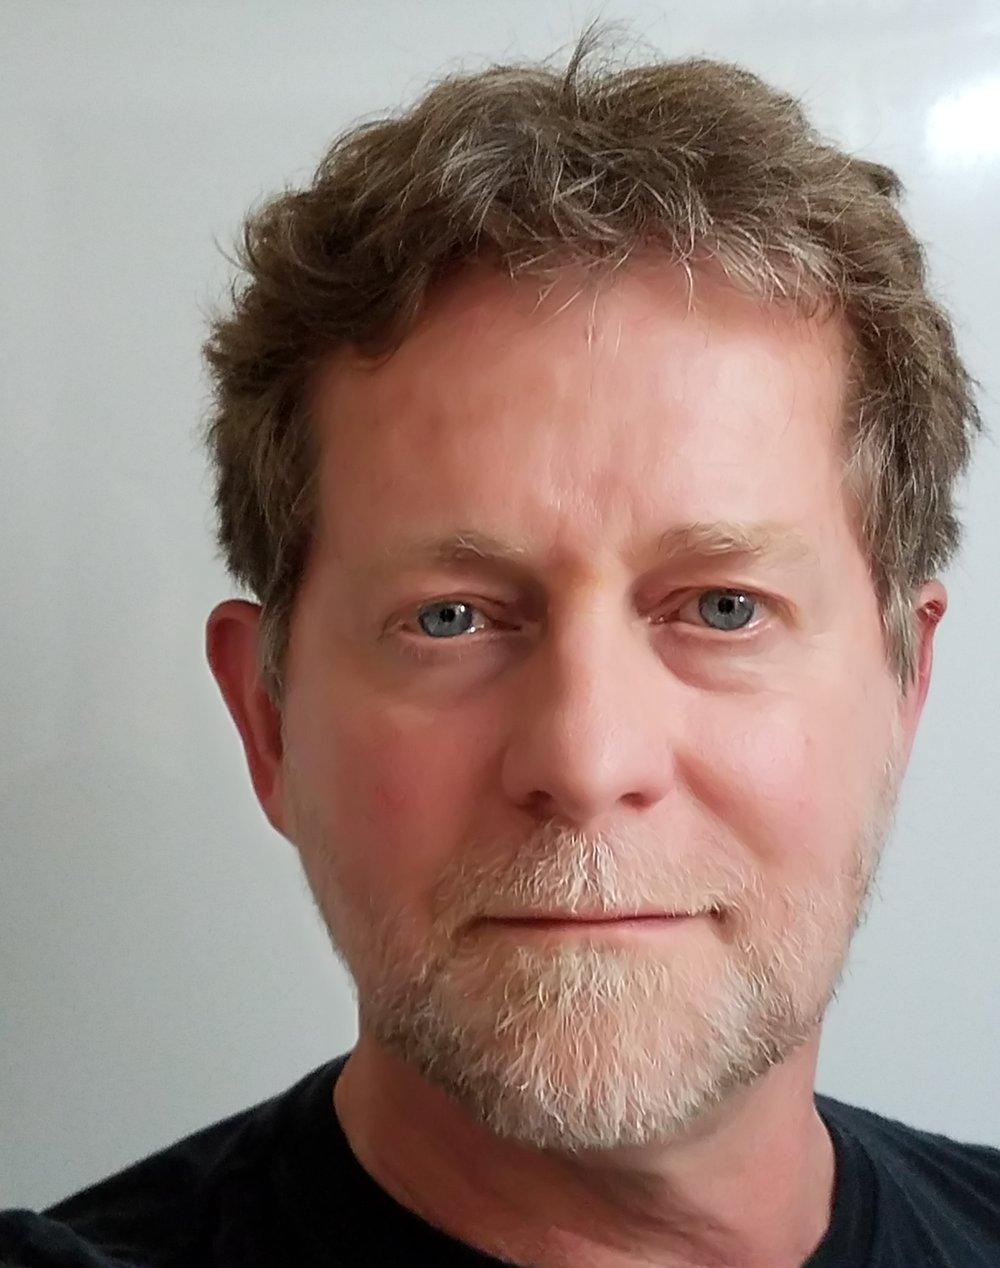 Tim Peery - Director of KOZM llc